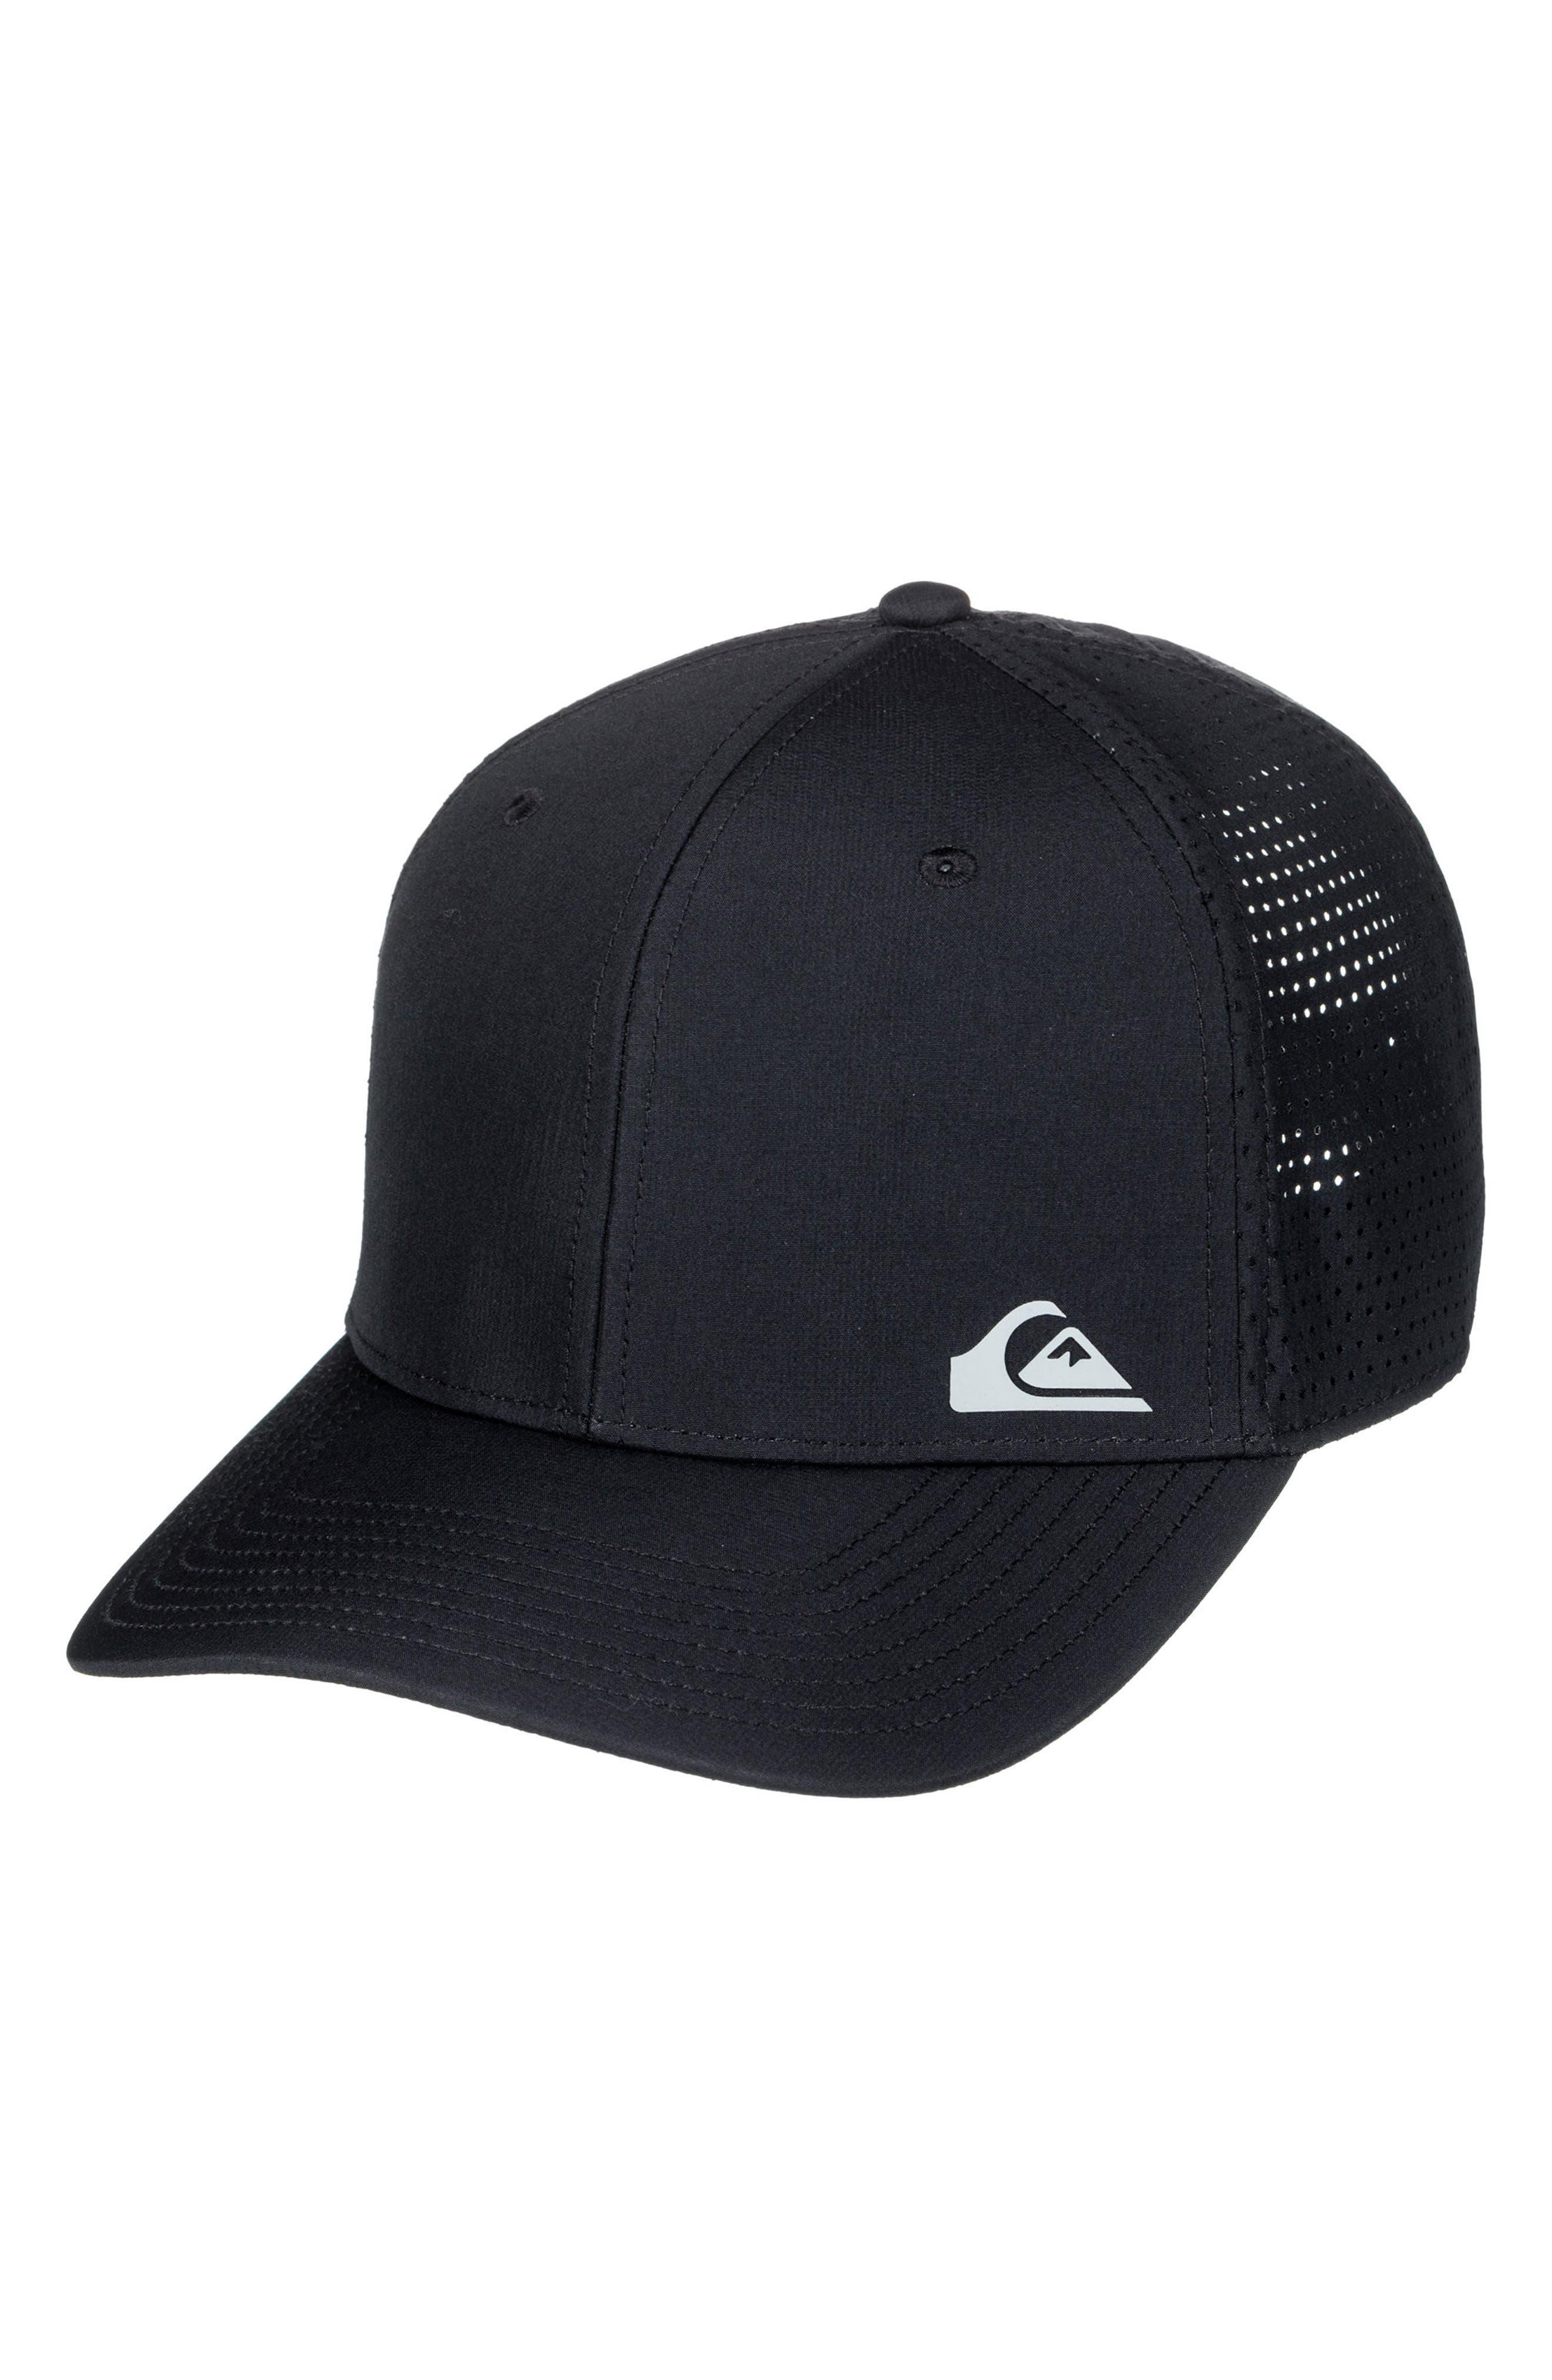 Technabutter Baseball Cap,                             Main thumbnail 1, color,                             Black